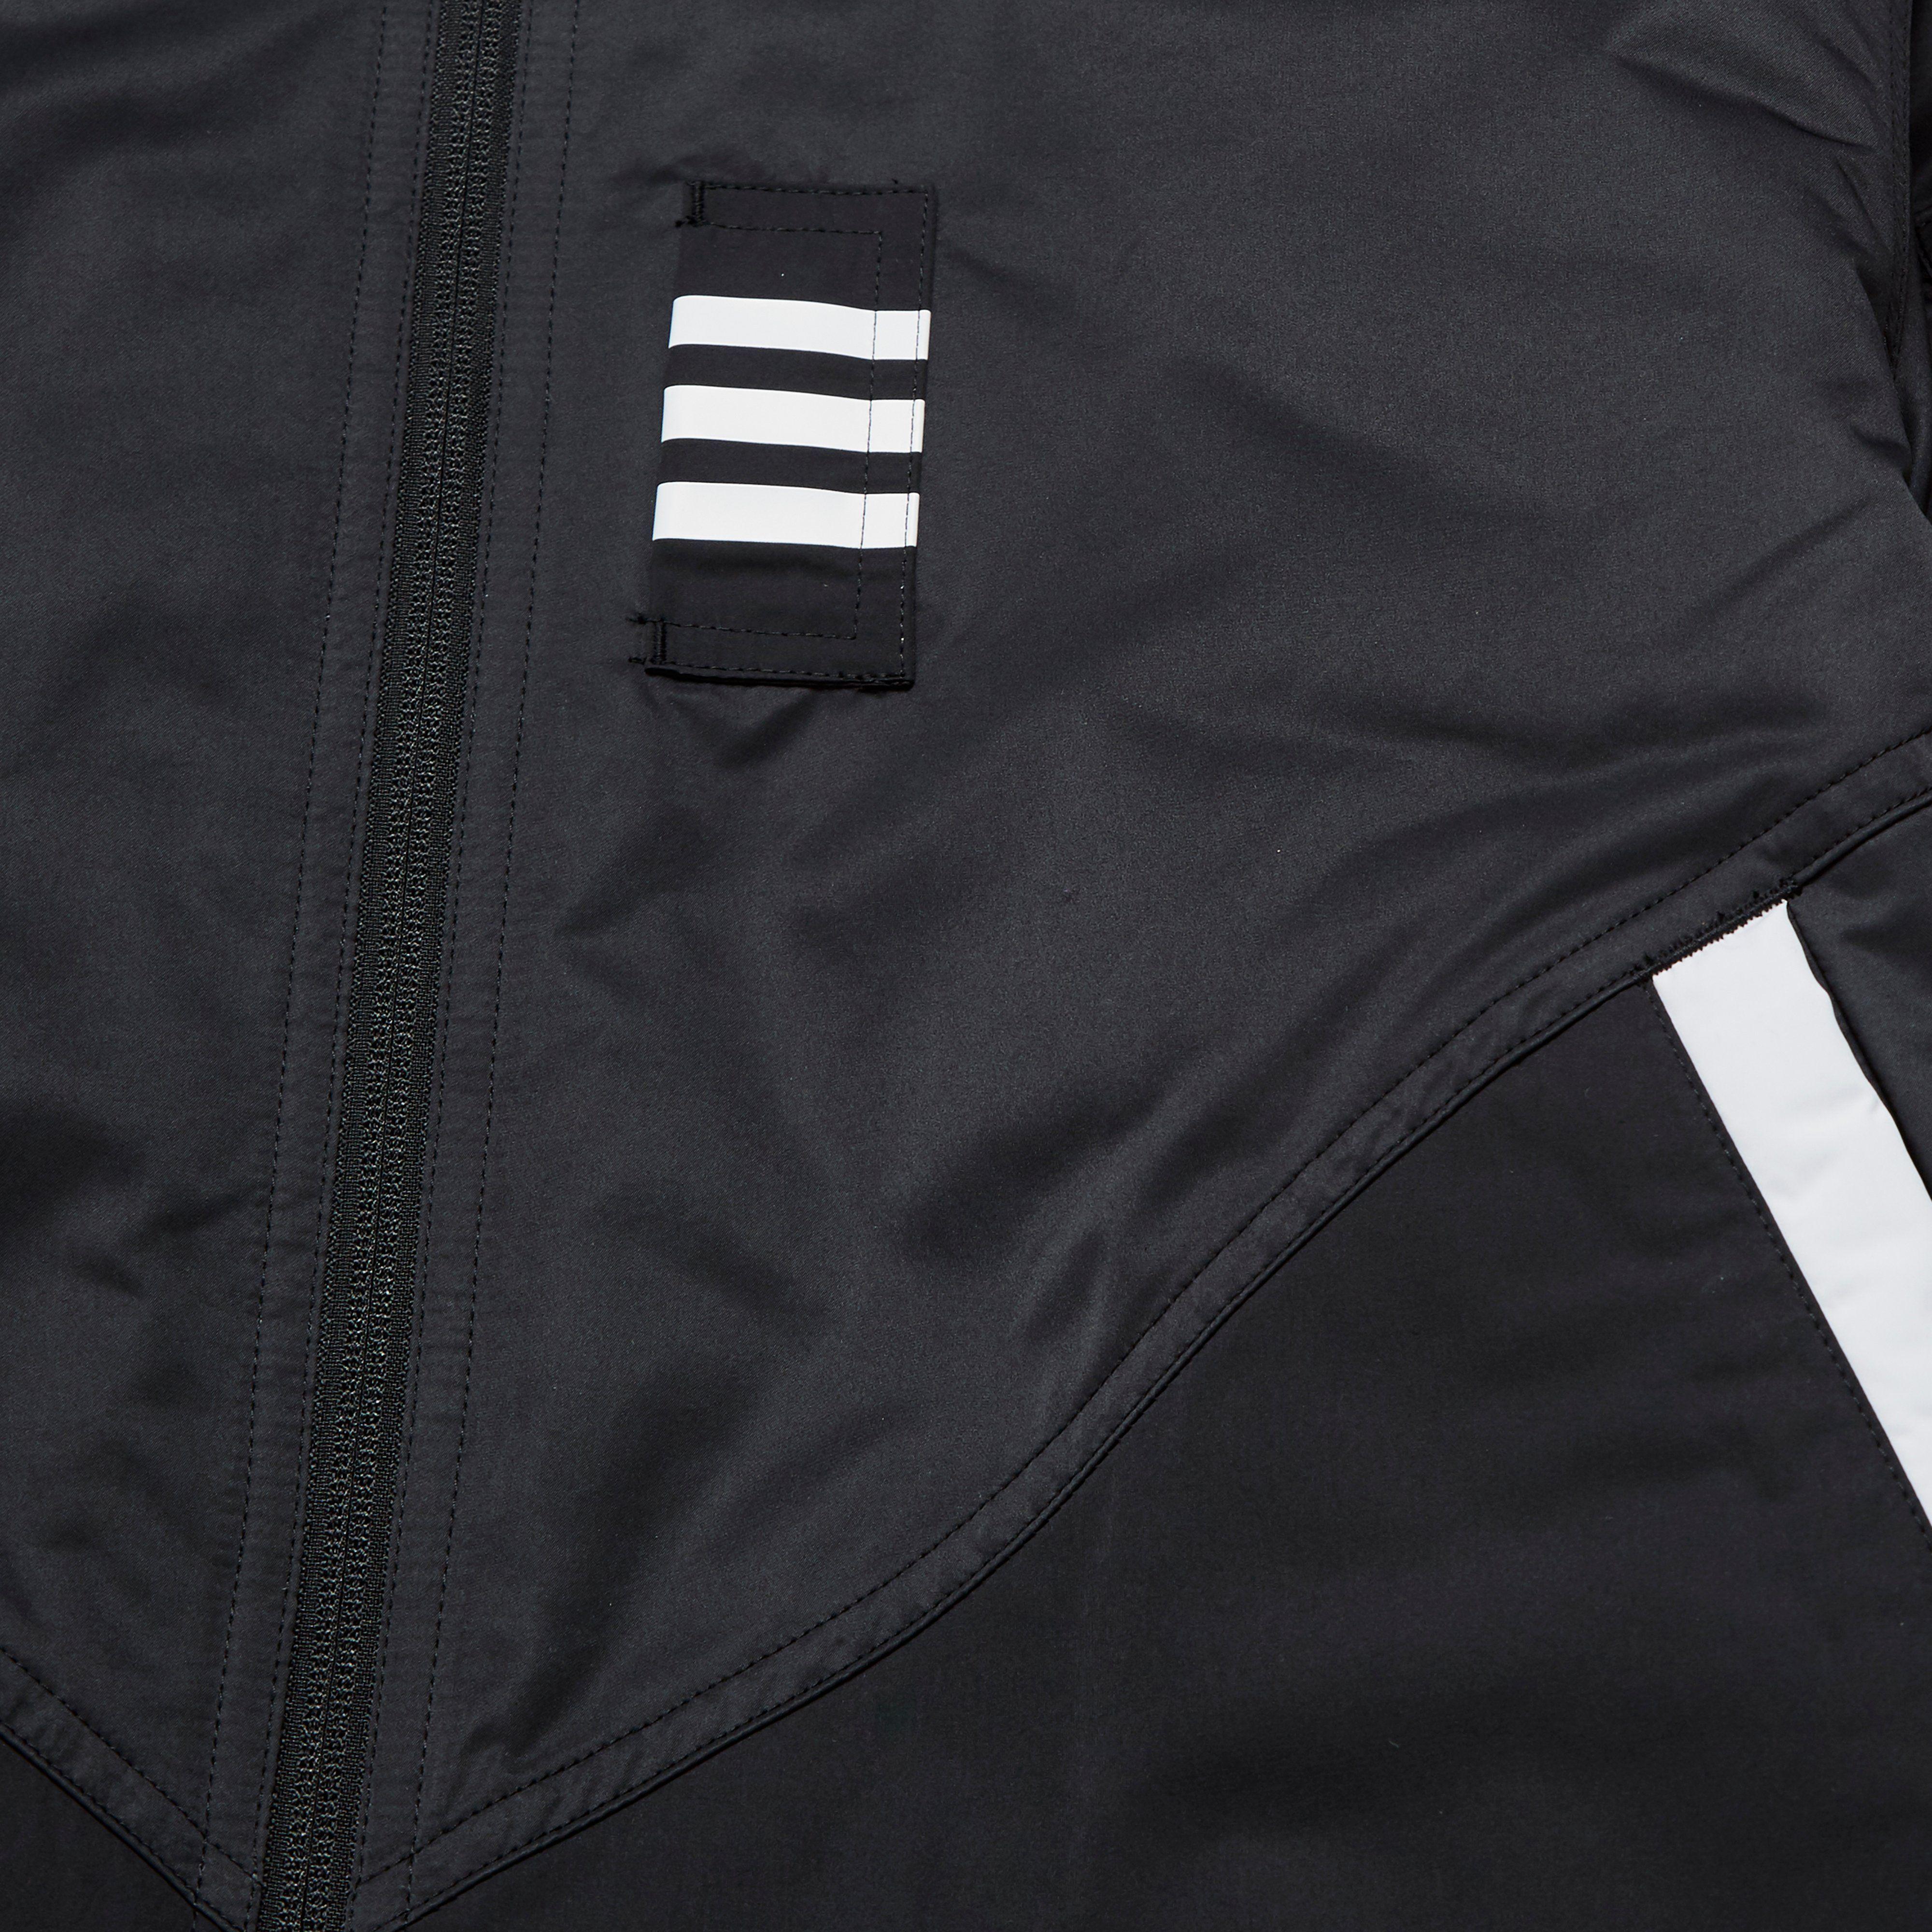 adidas Originals X White Mountaineering Flight Jacket